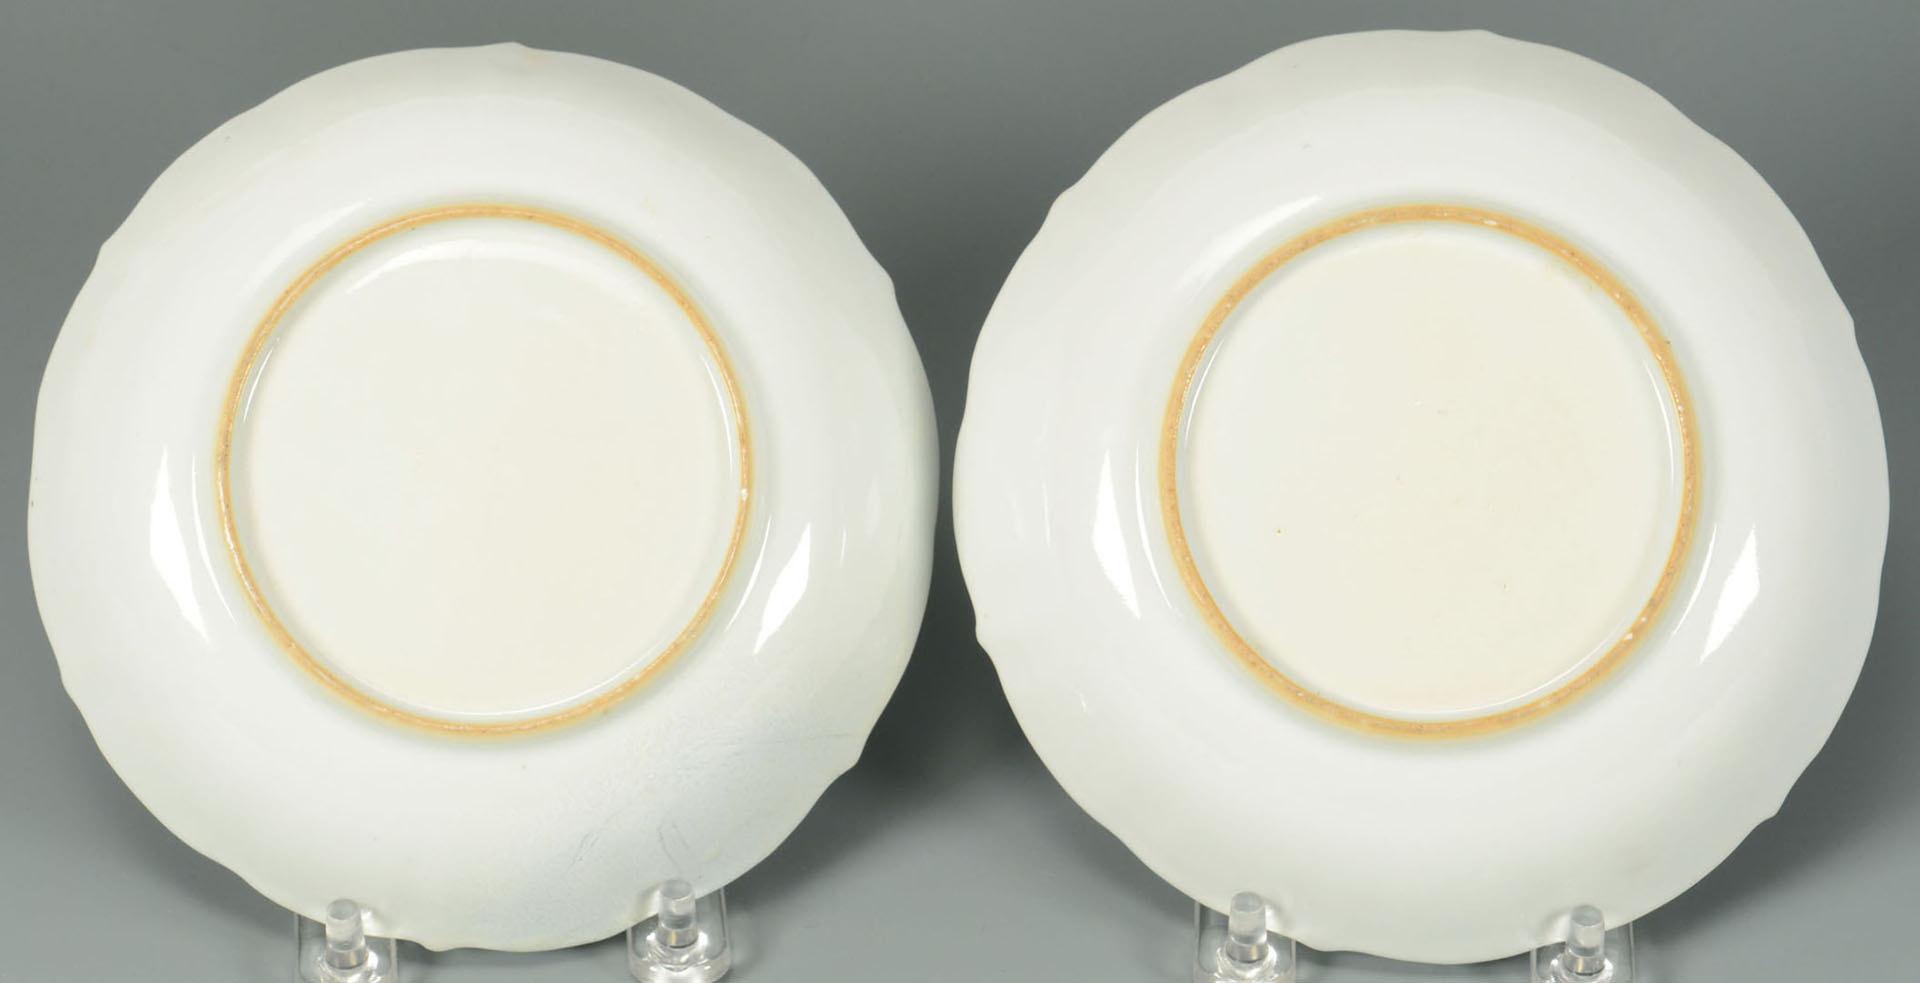 Lot 571: 8 pcs Blue and White Porcelain, Chinese & English